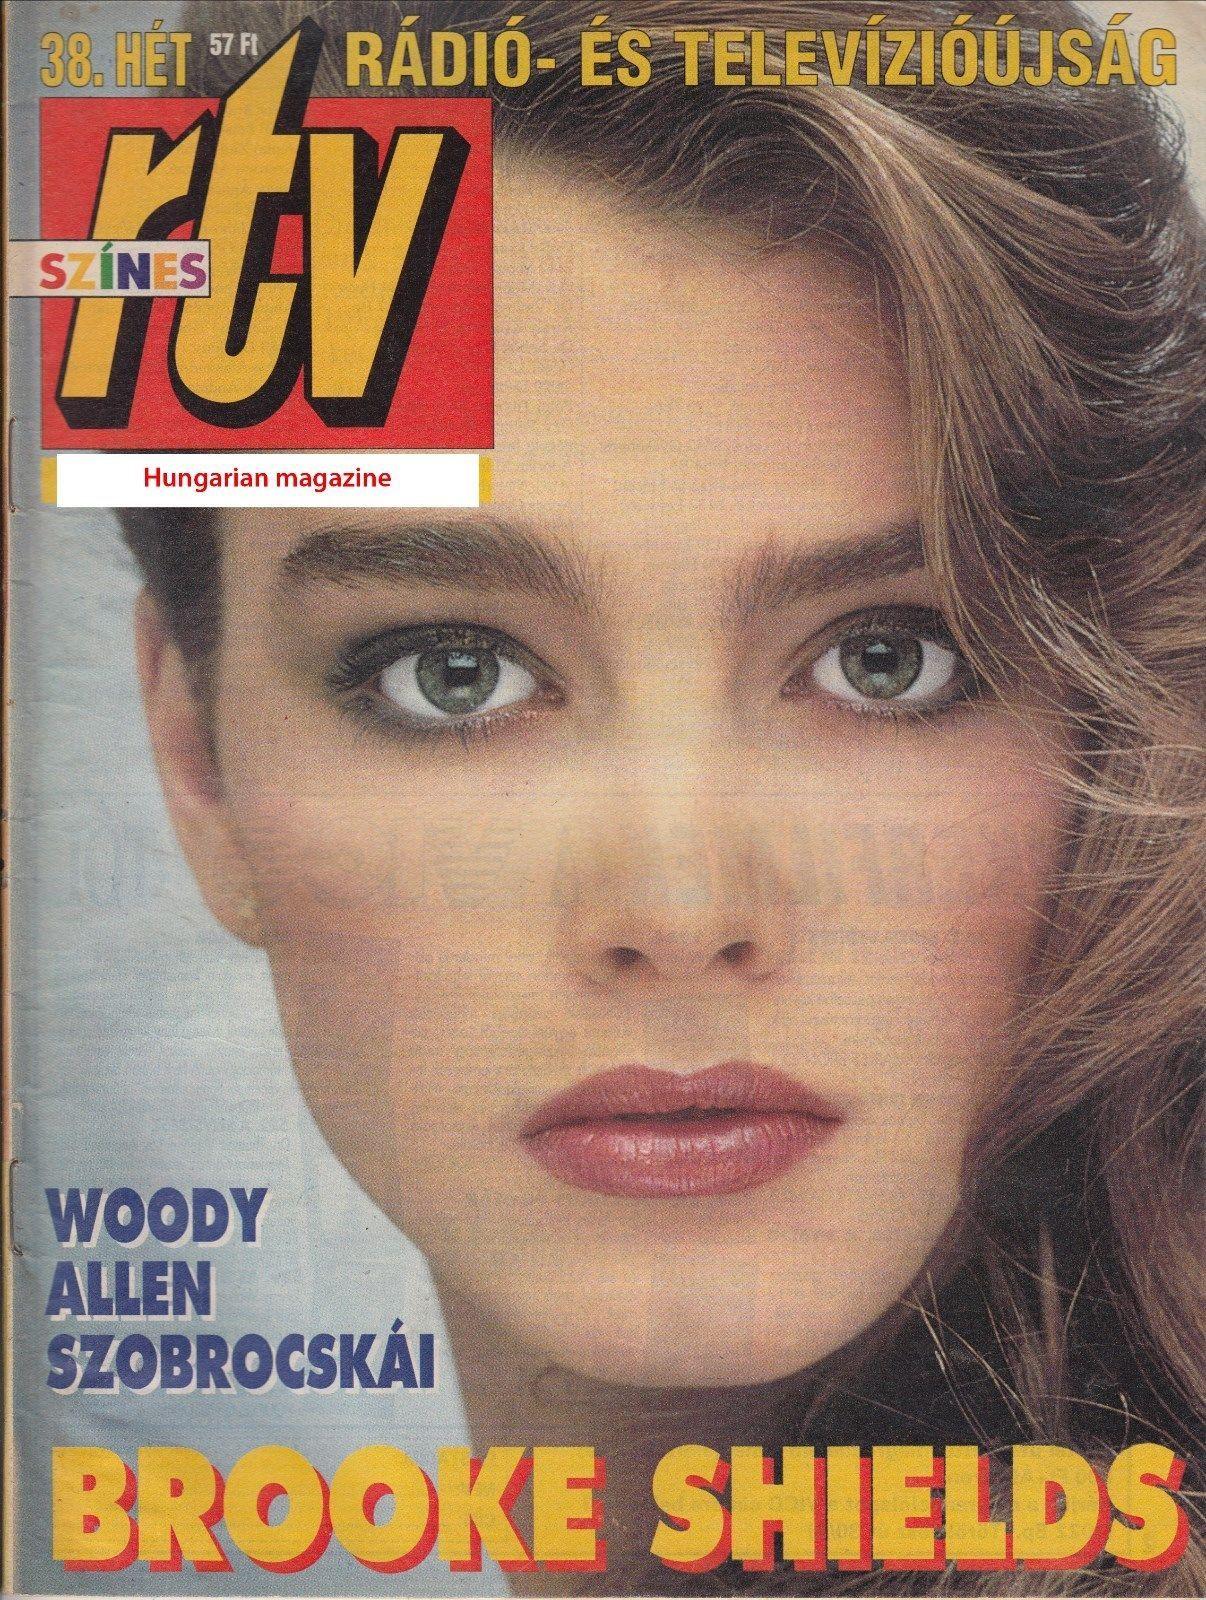 Brooke Shields covers RTV (Hungary), circa 1994.